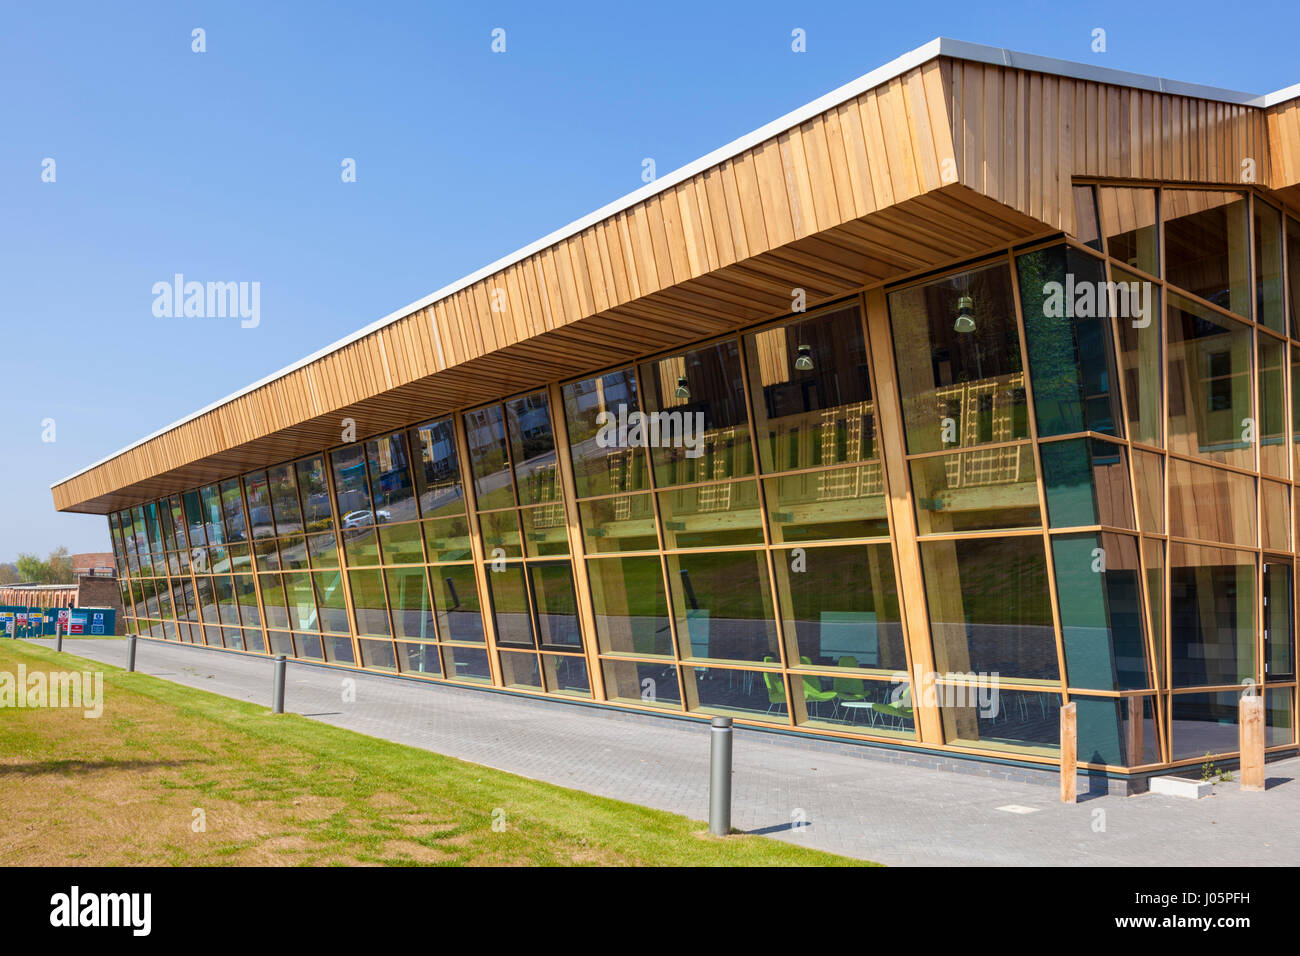 nottingham university GSK carbon neutral laboratory for sustainable chemistry building Jubilee campus nottingham - Stock Image